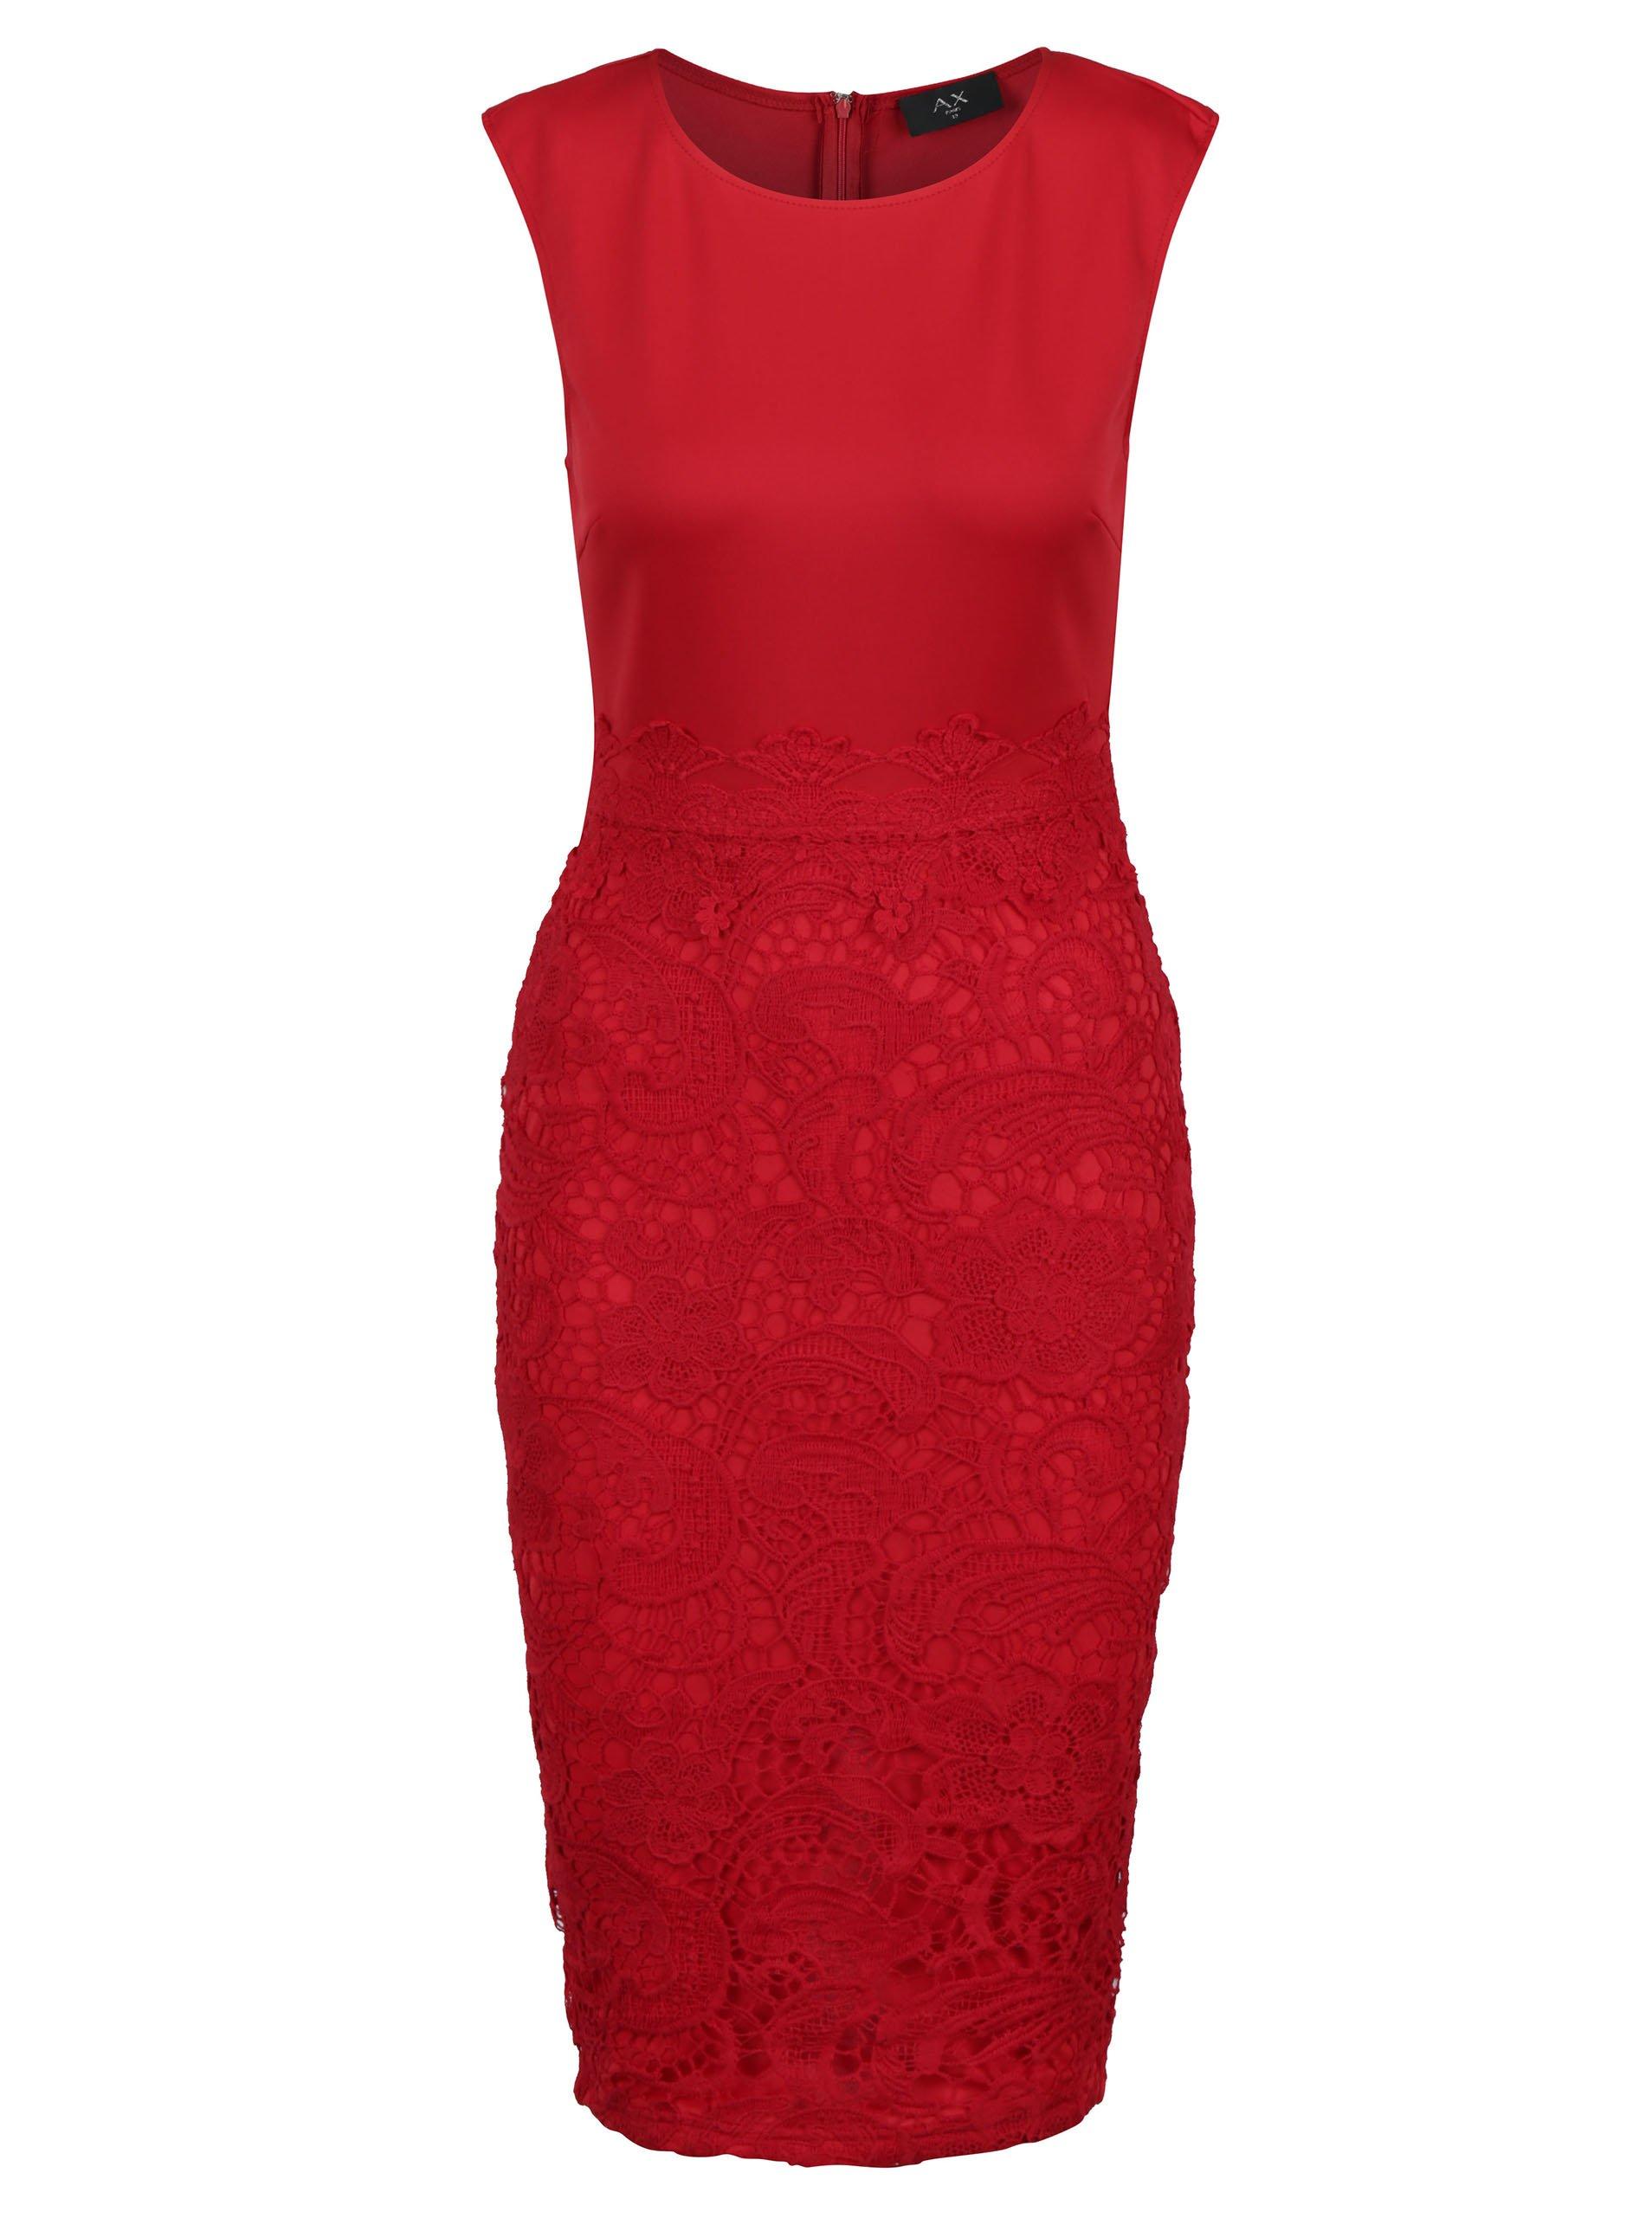 a8409b8d9b0d Červené puzdrové šaty s čipkou AX Paris